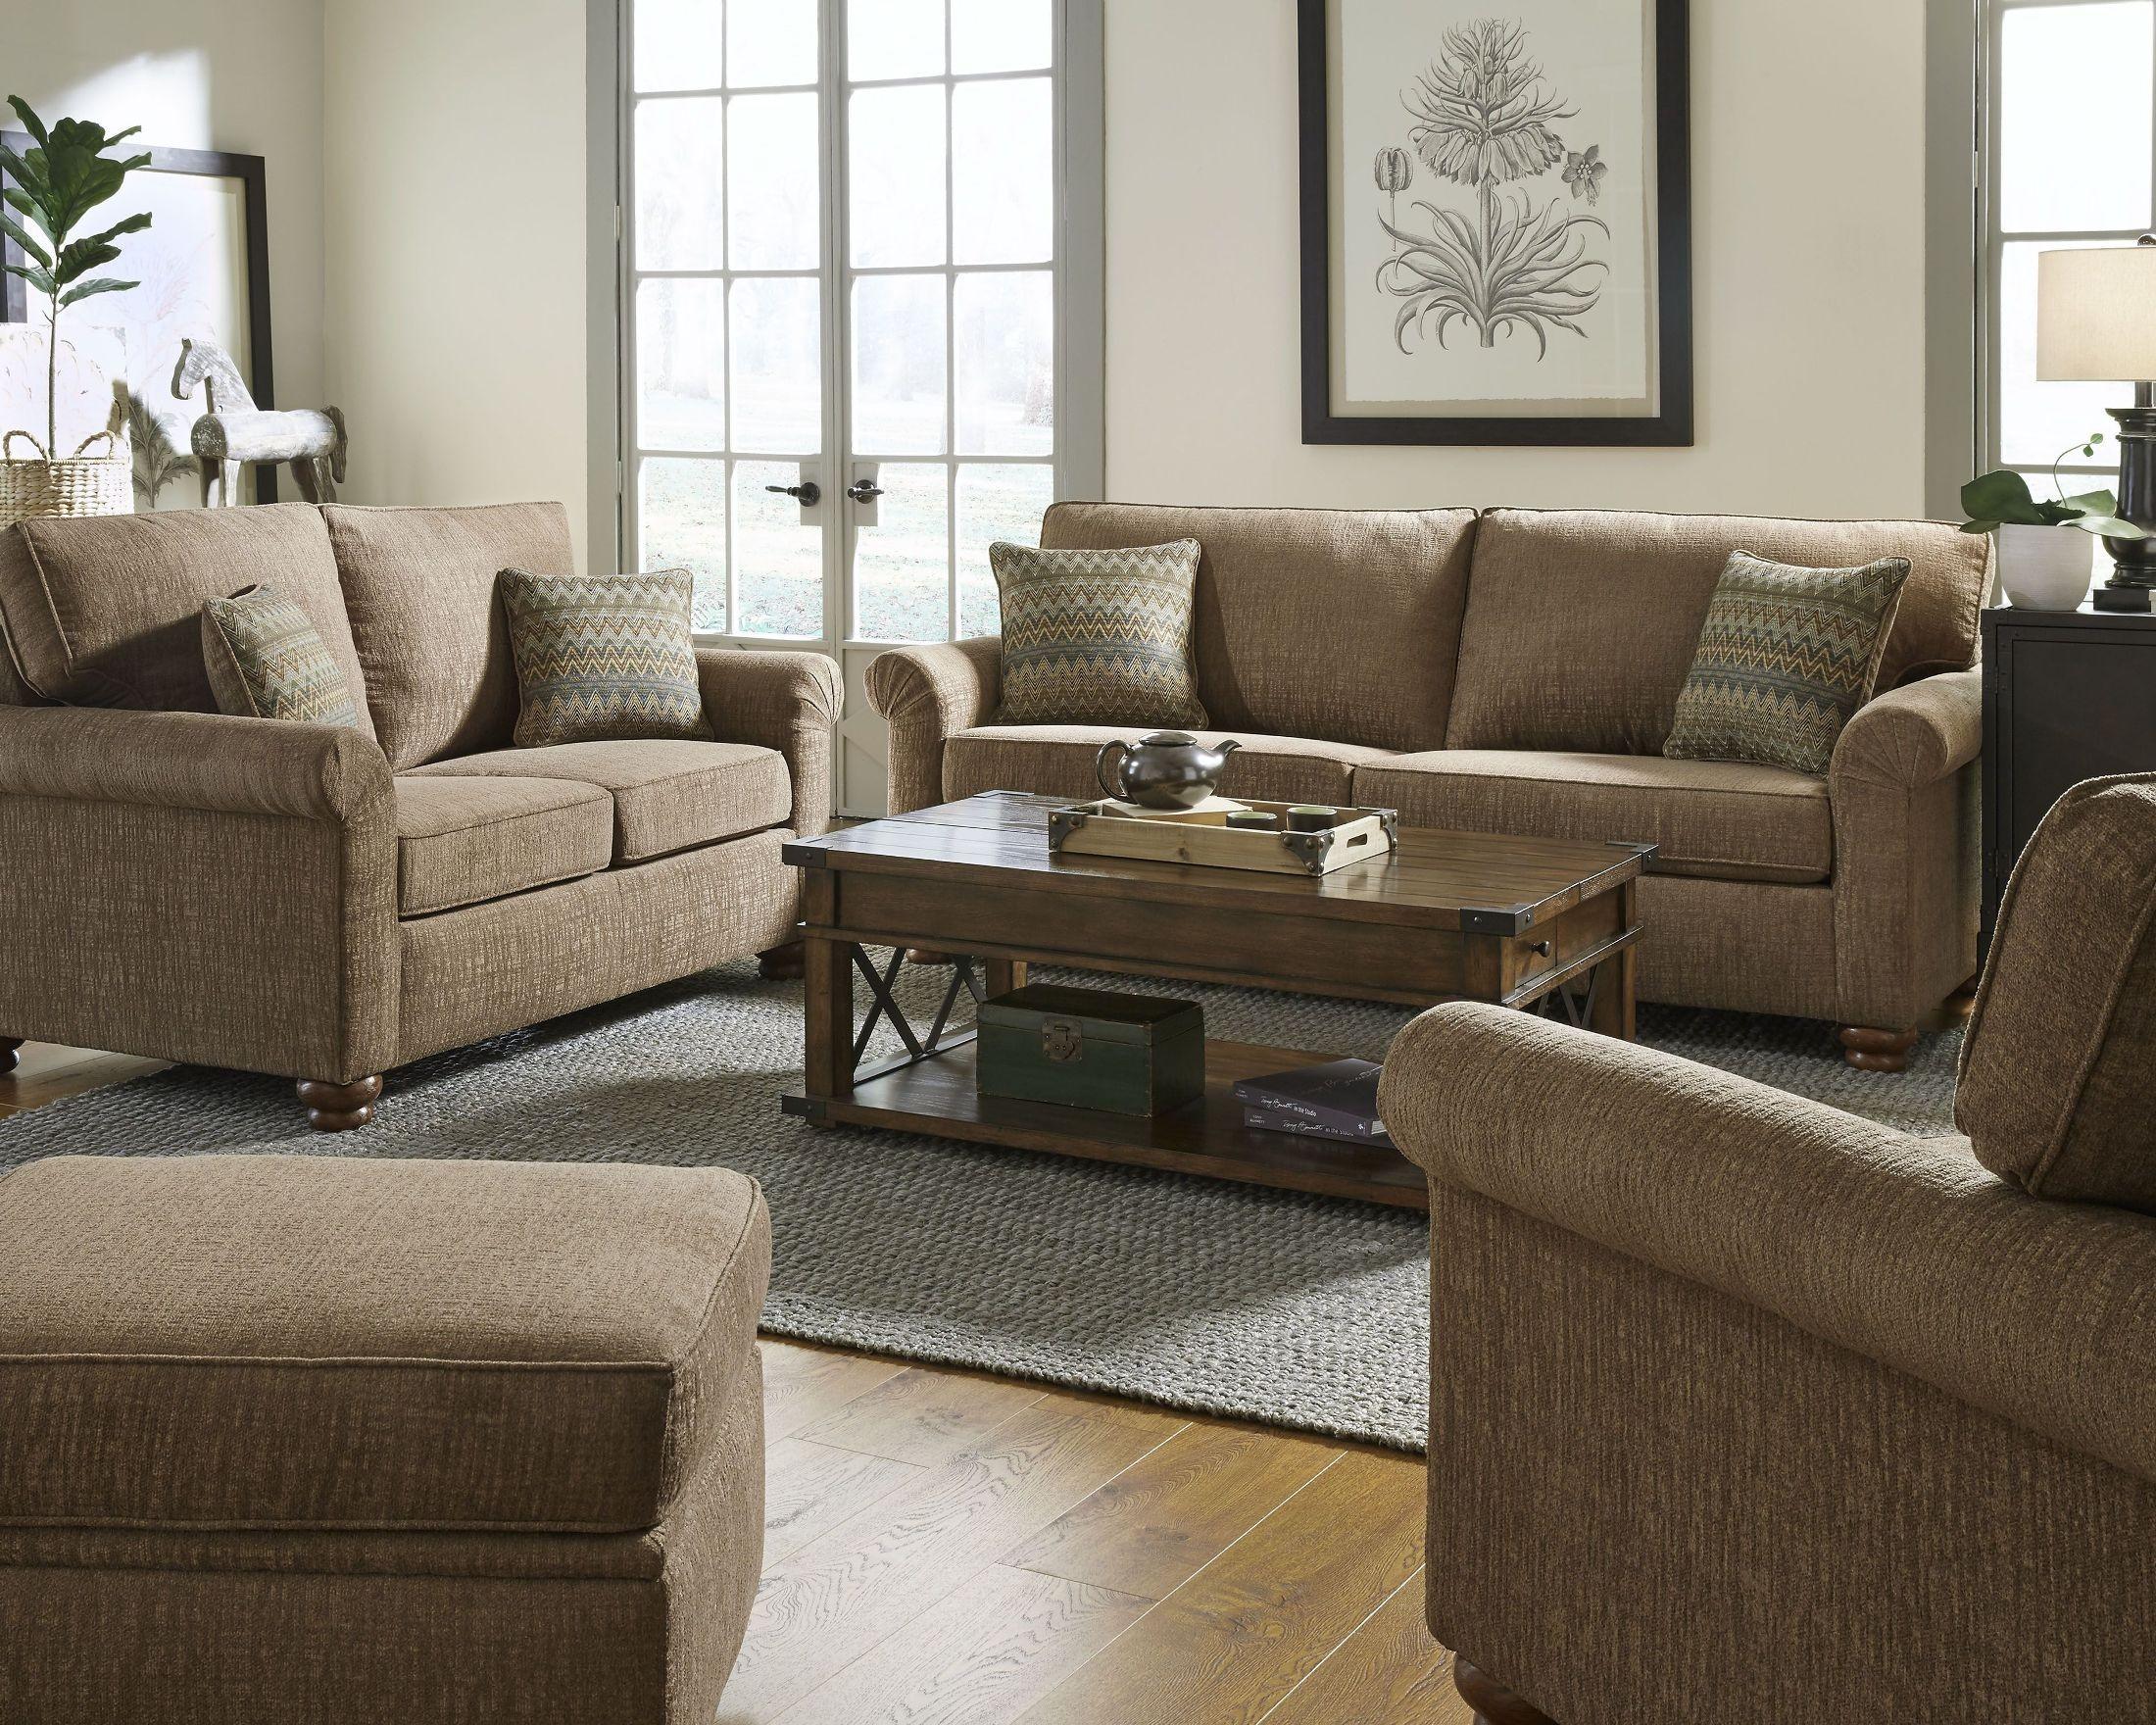 Awesome Aubrey Mocha Living Room Set Download Free Architecture Designs Intelgarnamadebymaigaardcom